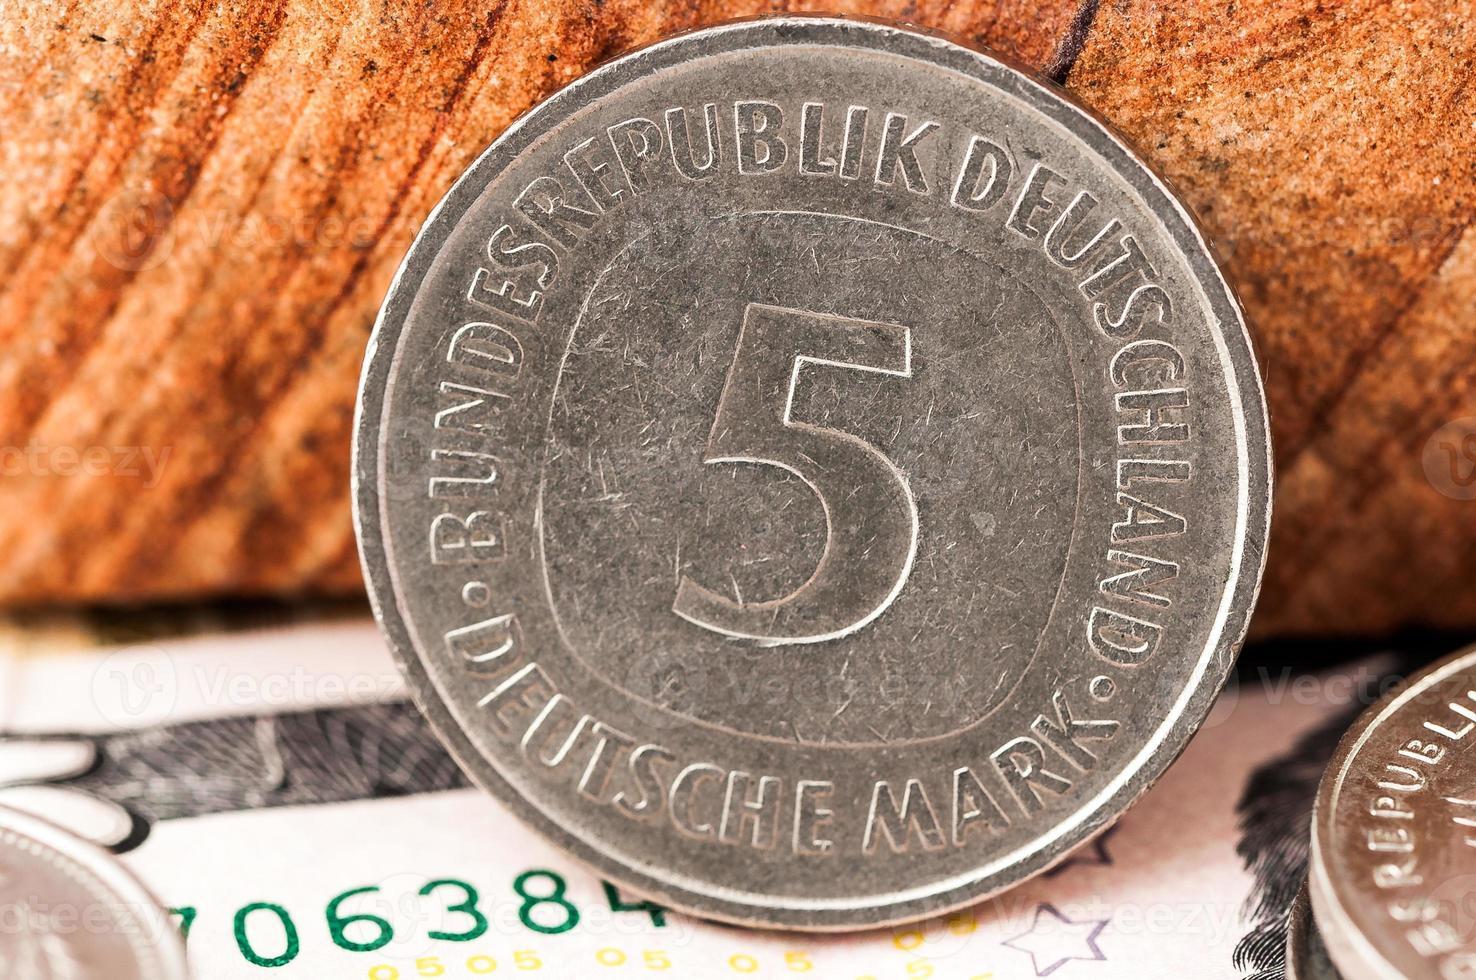 5 cinco marcos alemanes bundesrepubik deutschland foto